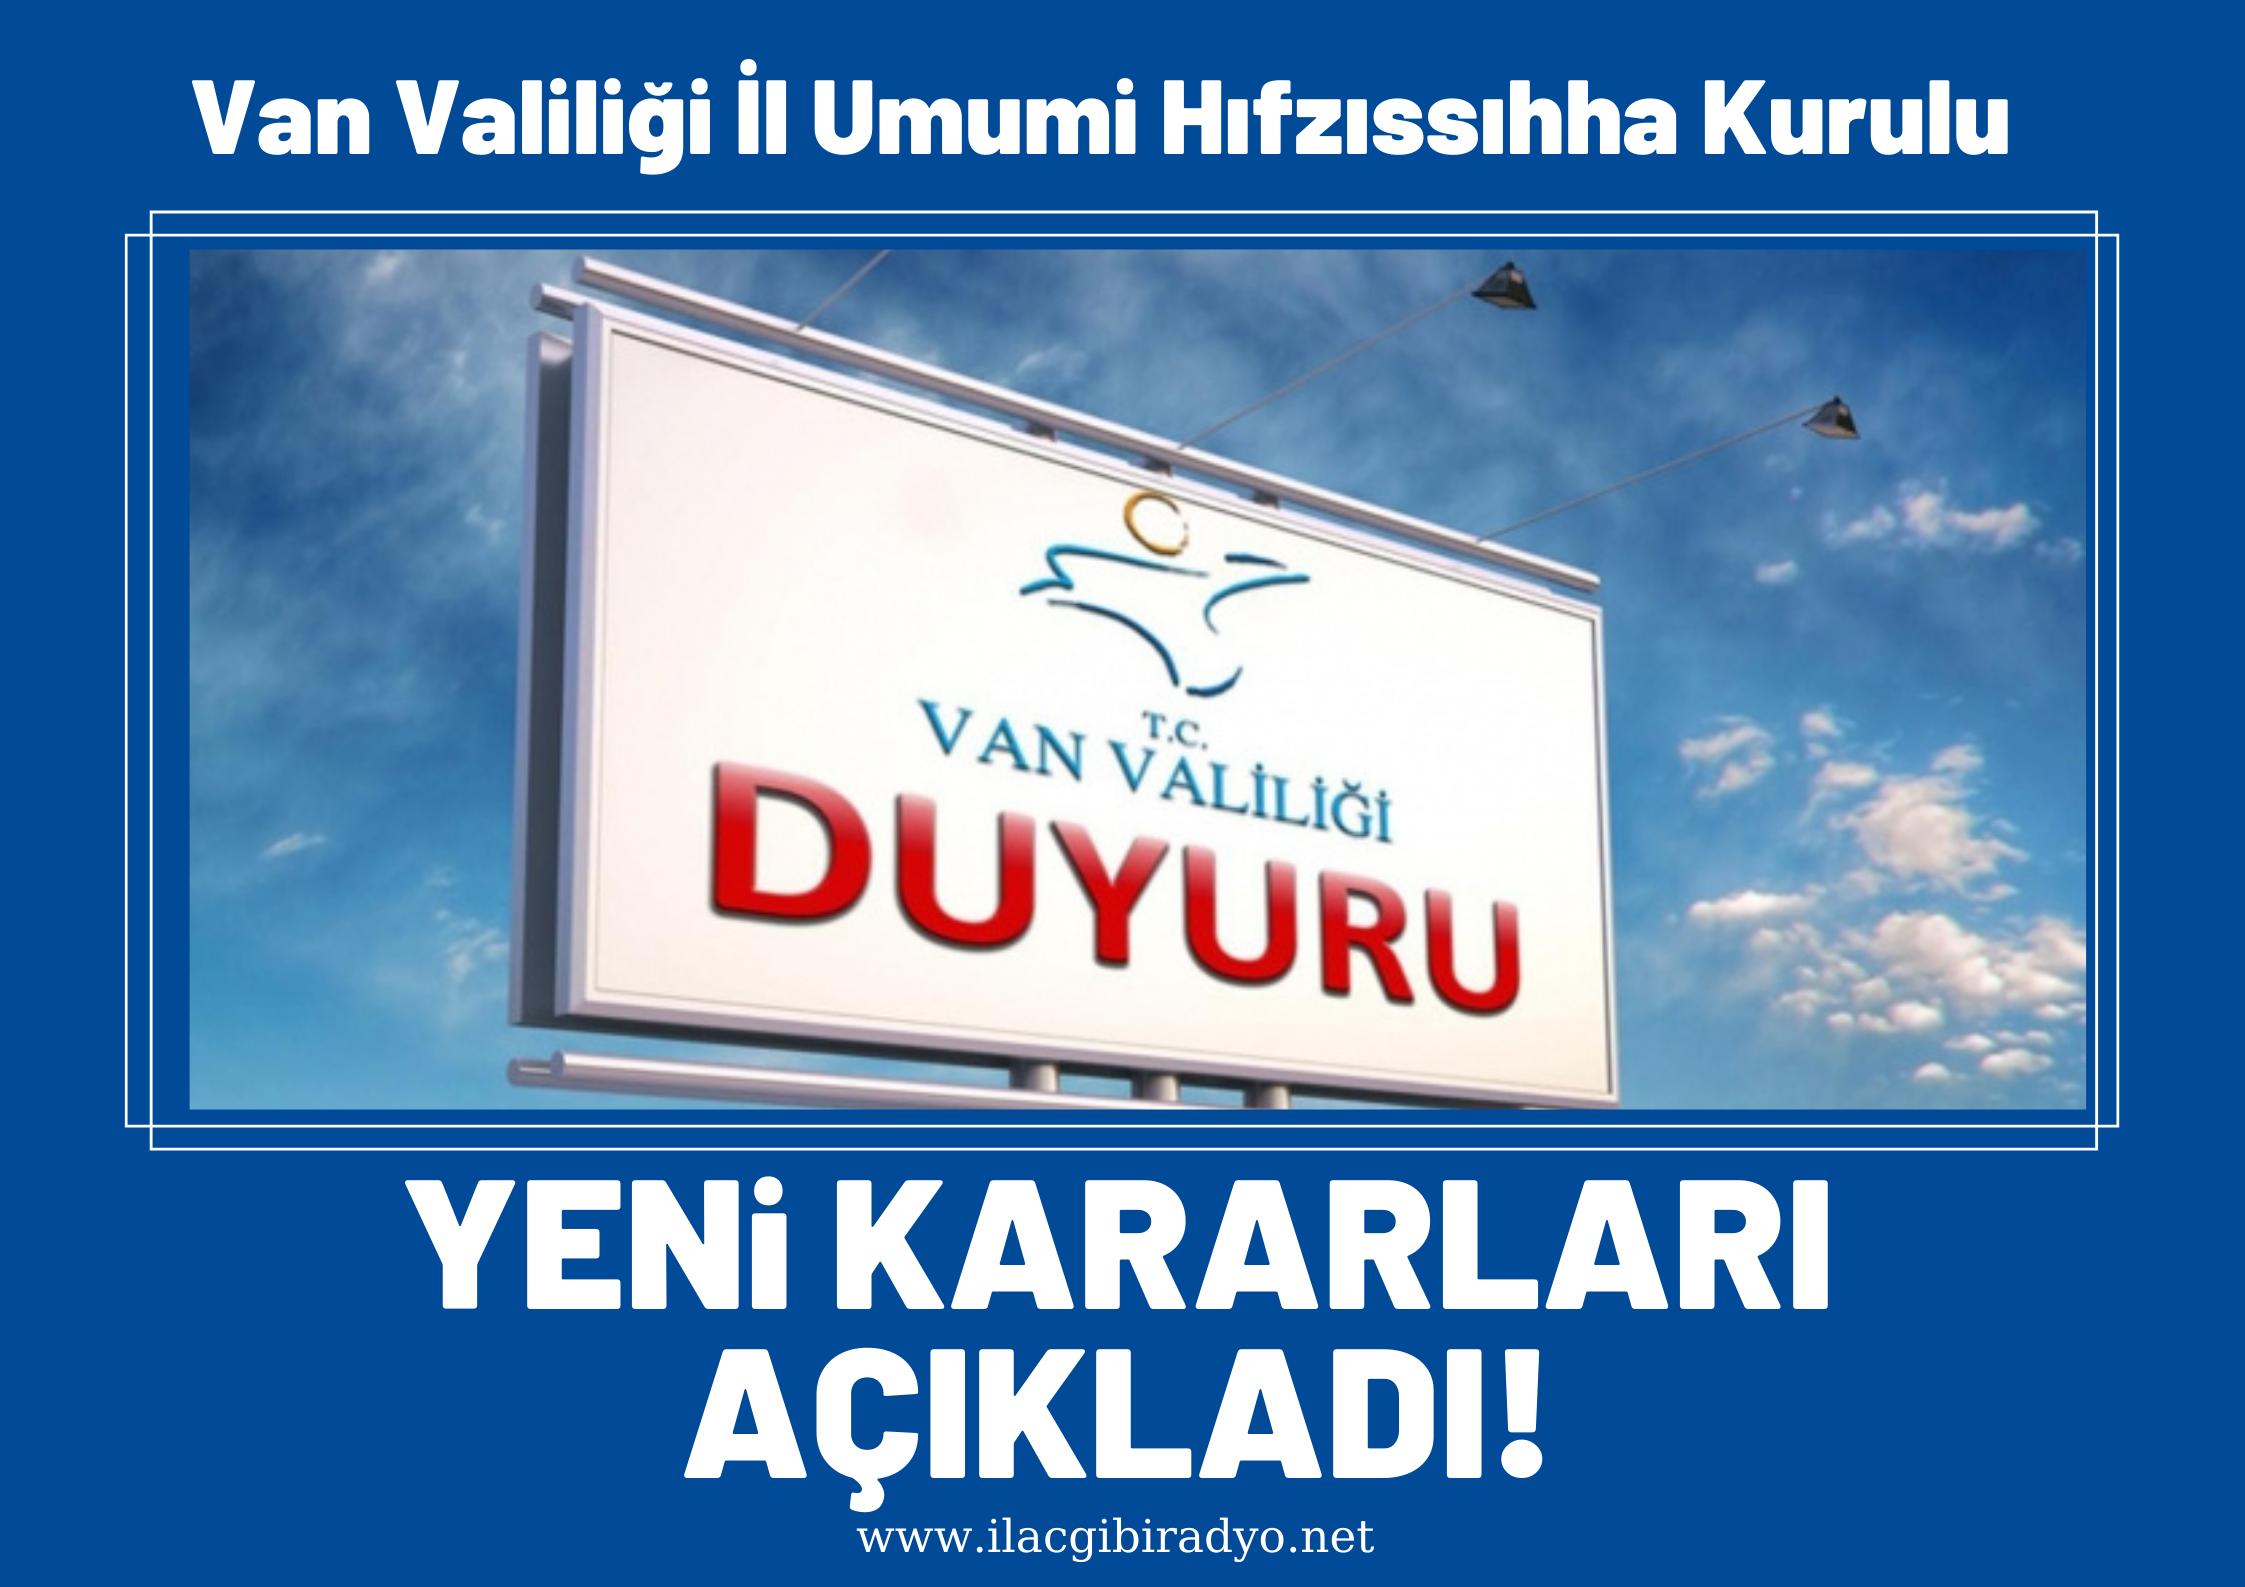 Van Valiliği İl Umumi Hıfzıssıhha Kurulu'nun aldığı yeni kararlar!